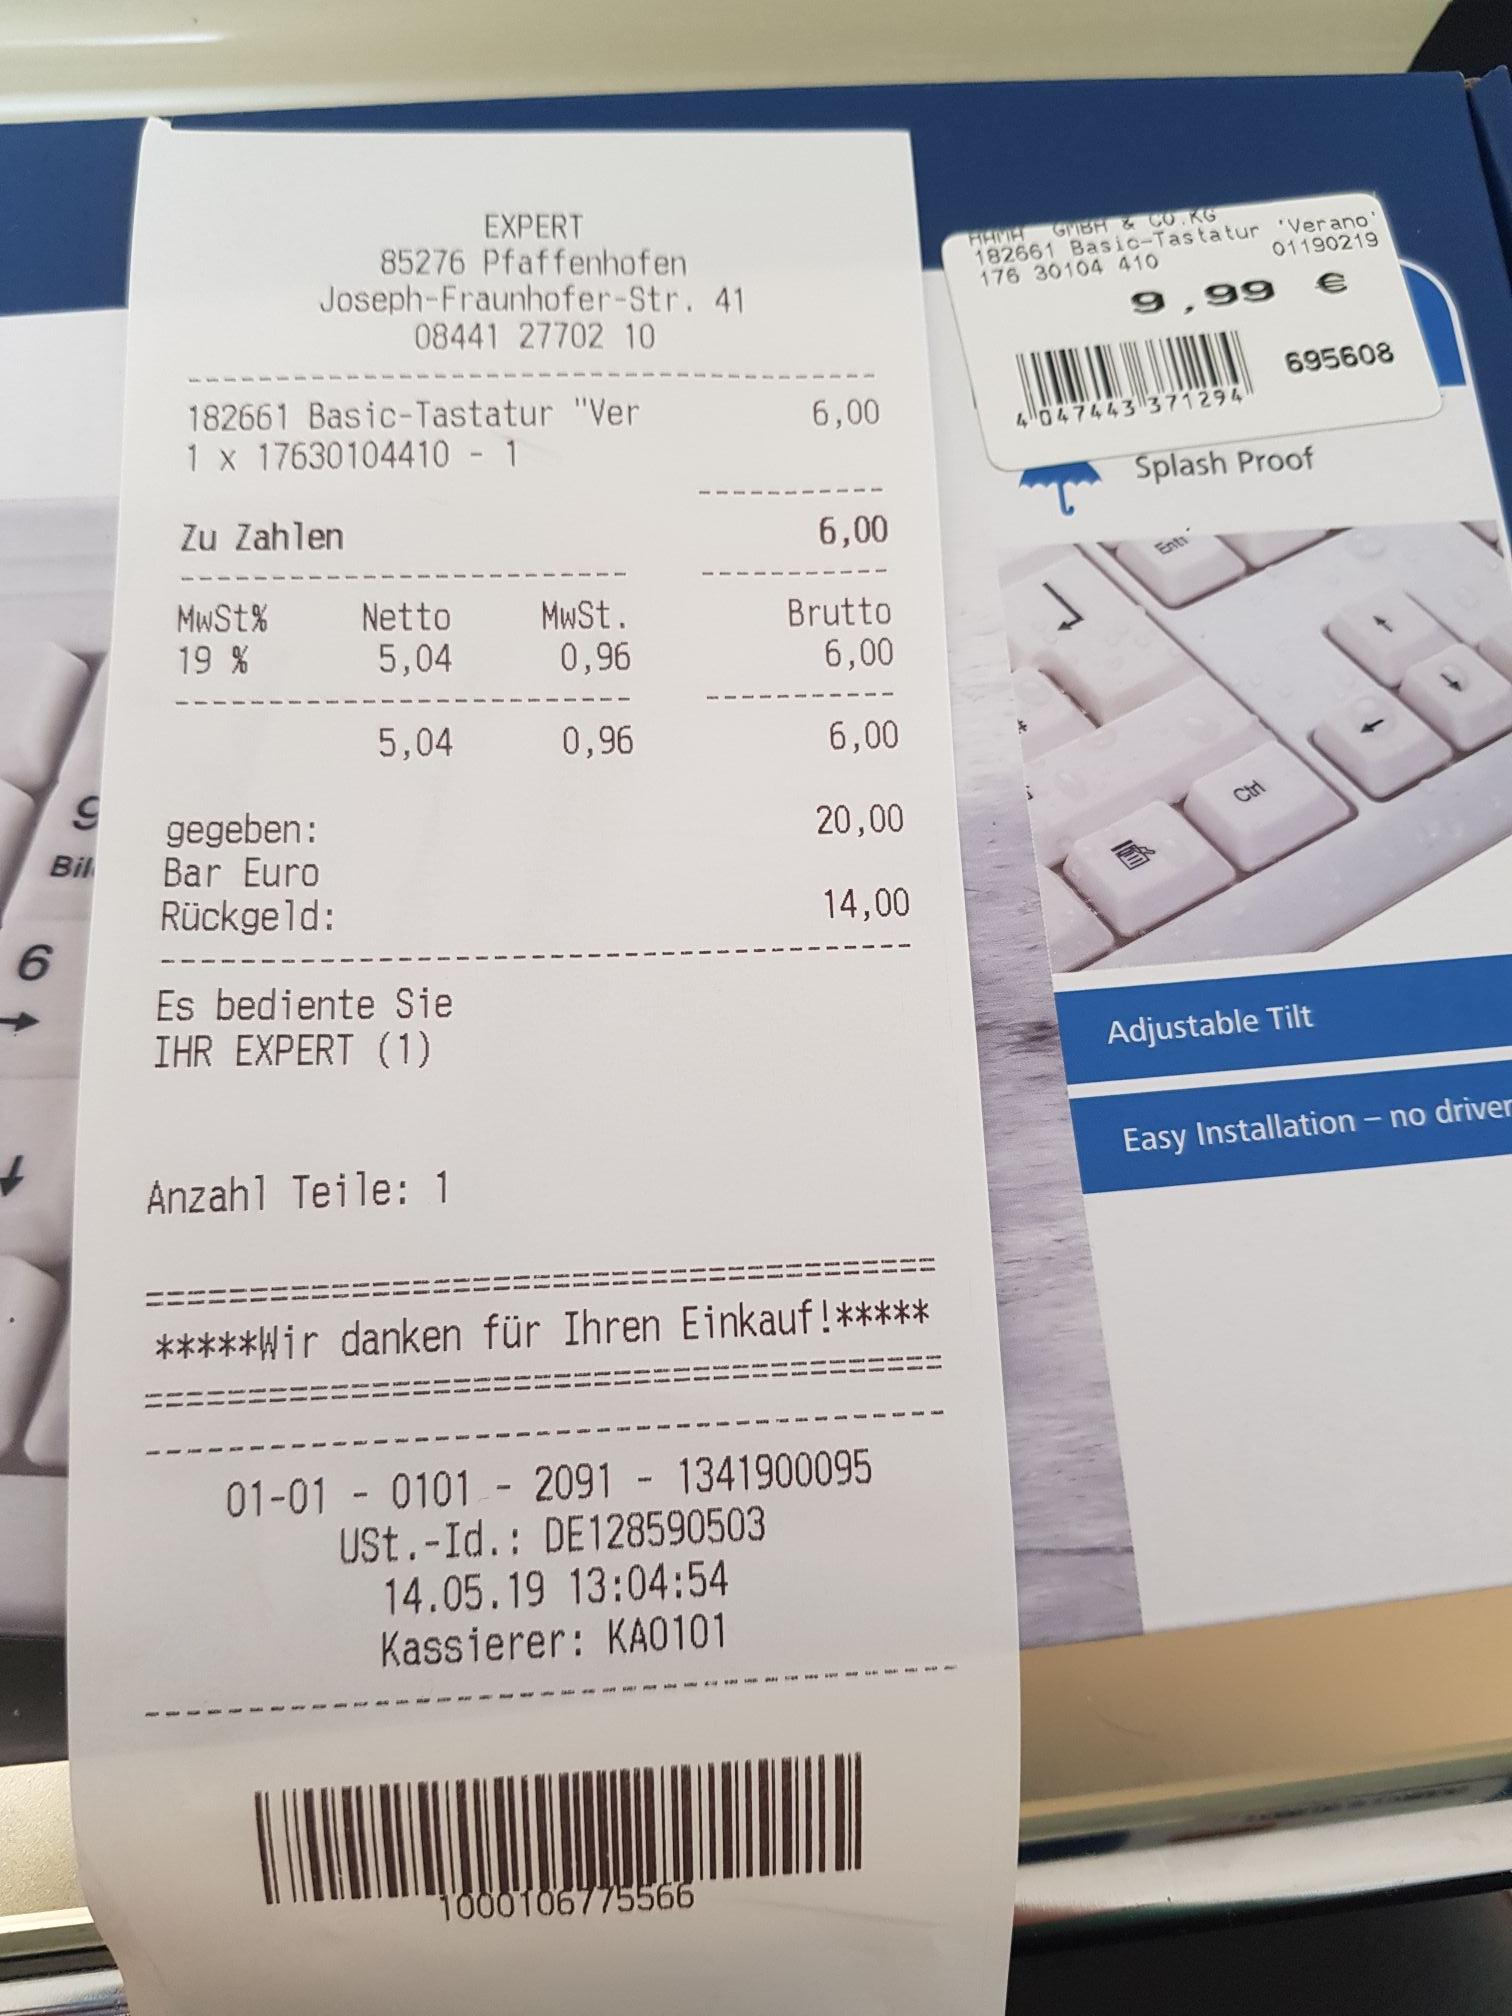 (Lokal?) Hama basic Tastatur verano weiß expert Pfaffenhofen